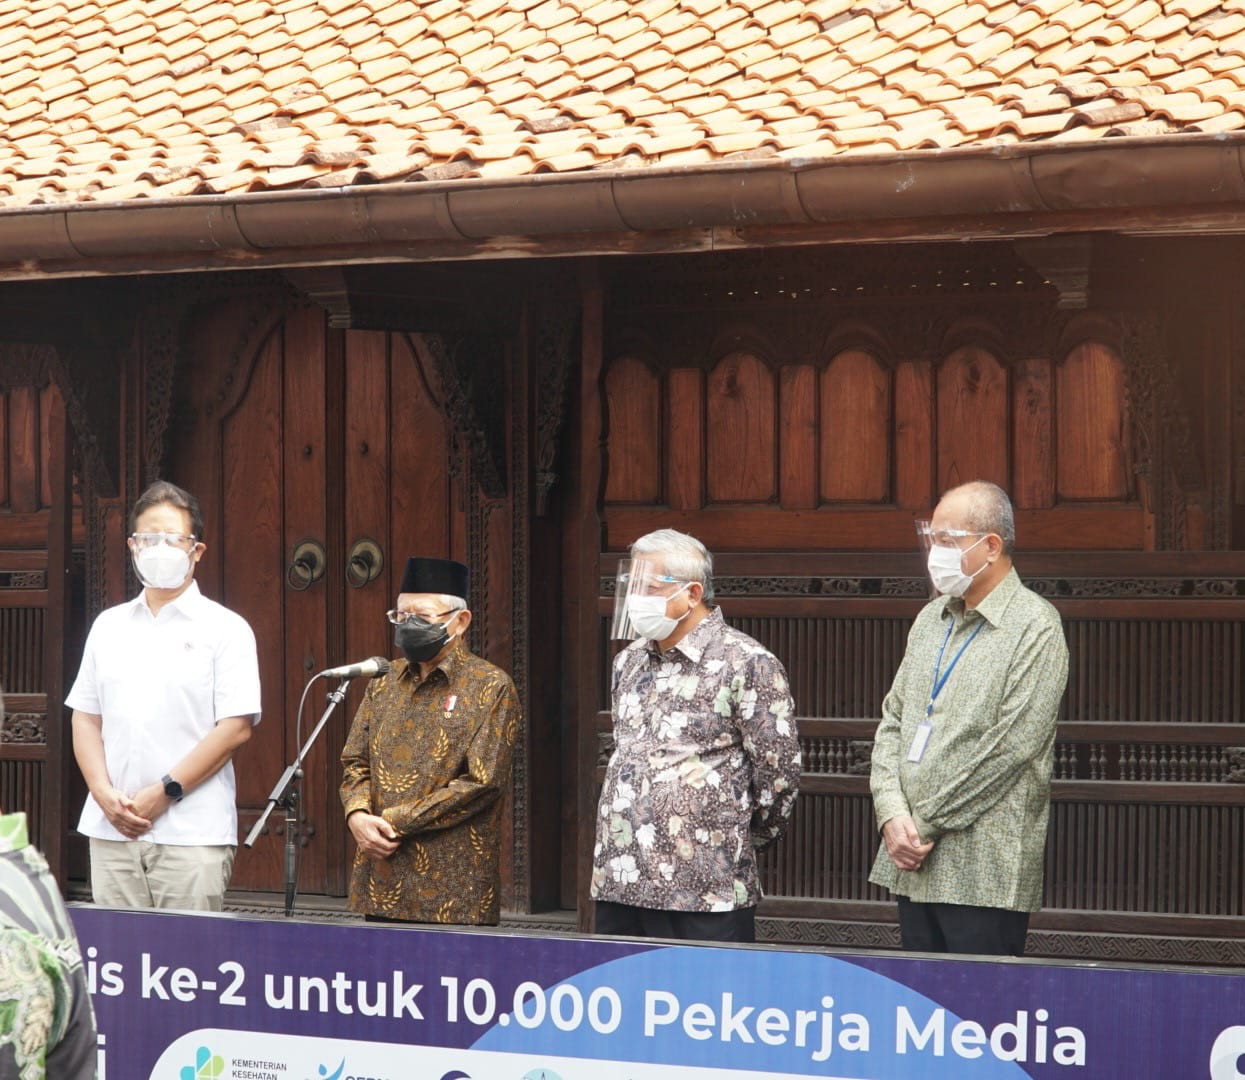 Wapres Ma'ruf Amin Kunjungi Sentra Vaksinasi Covid-19 Neoclinic - JPNN.com